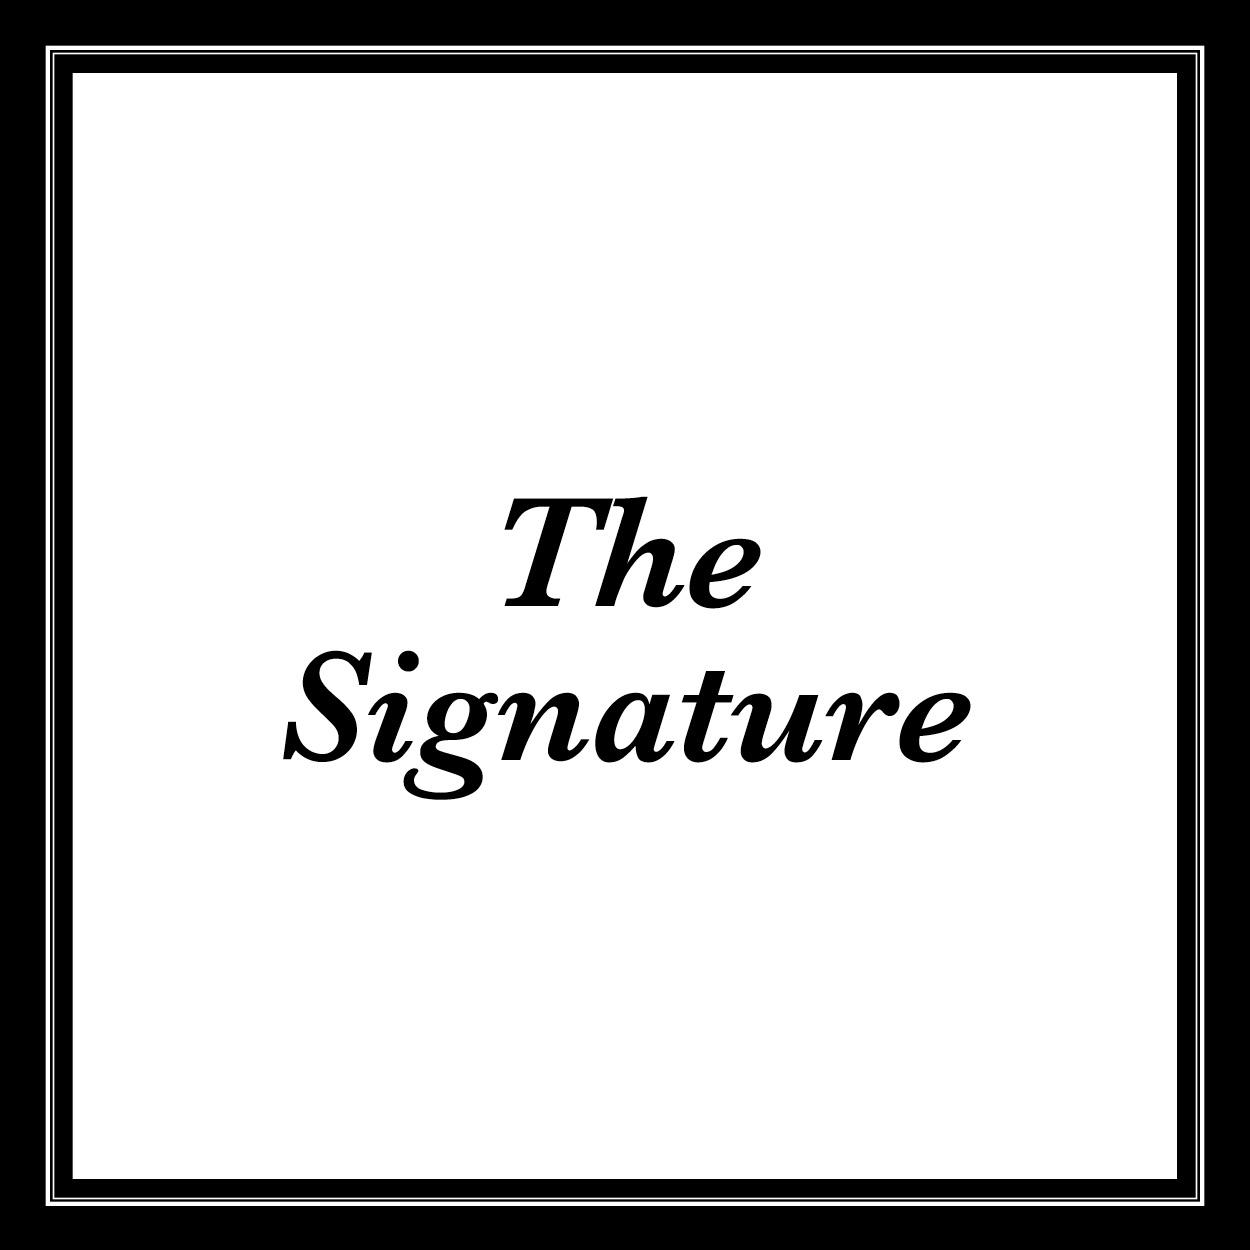 Thb signature text